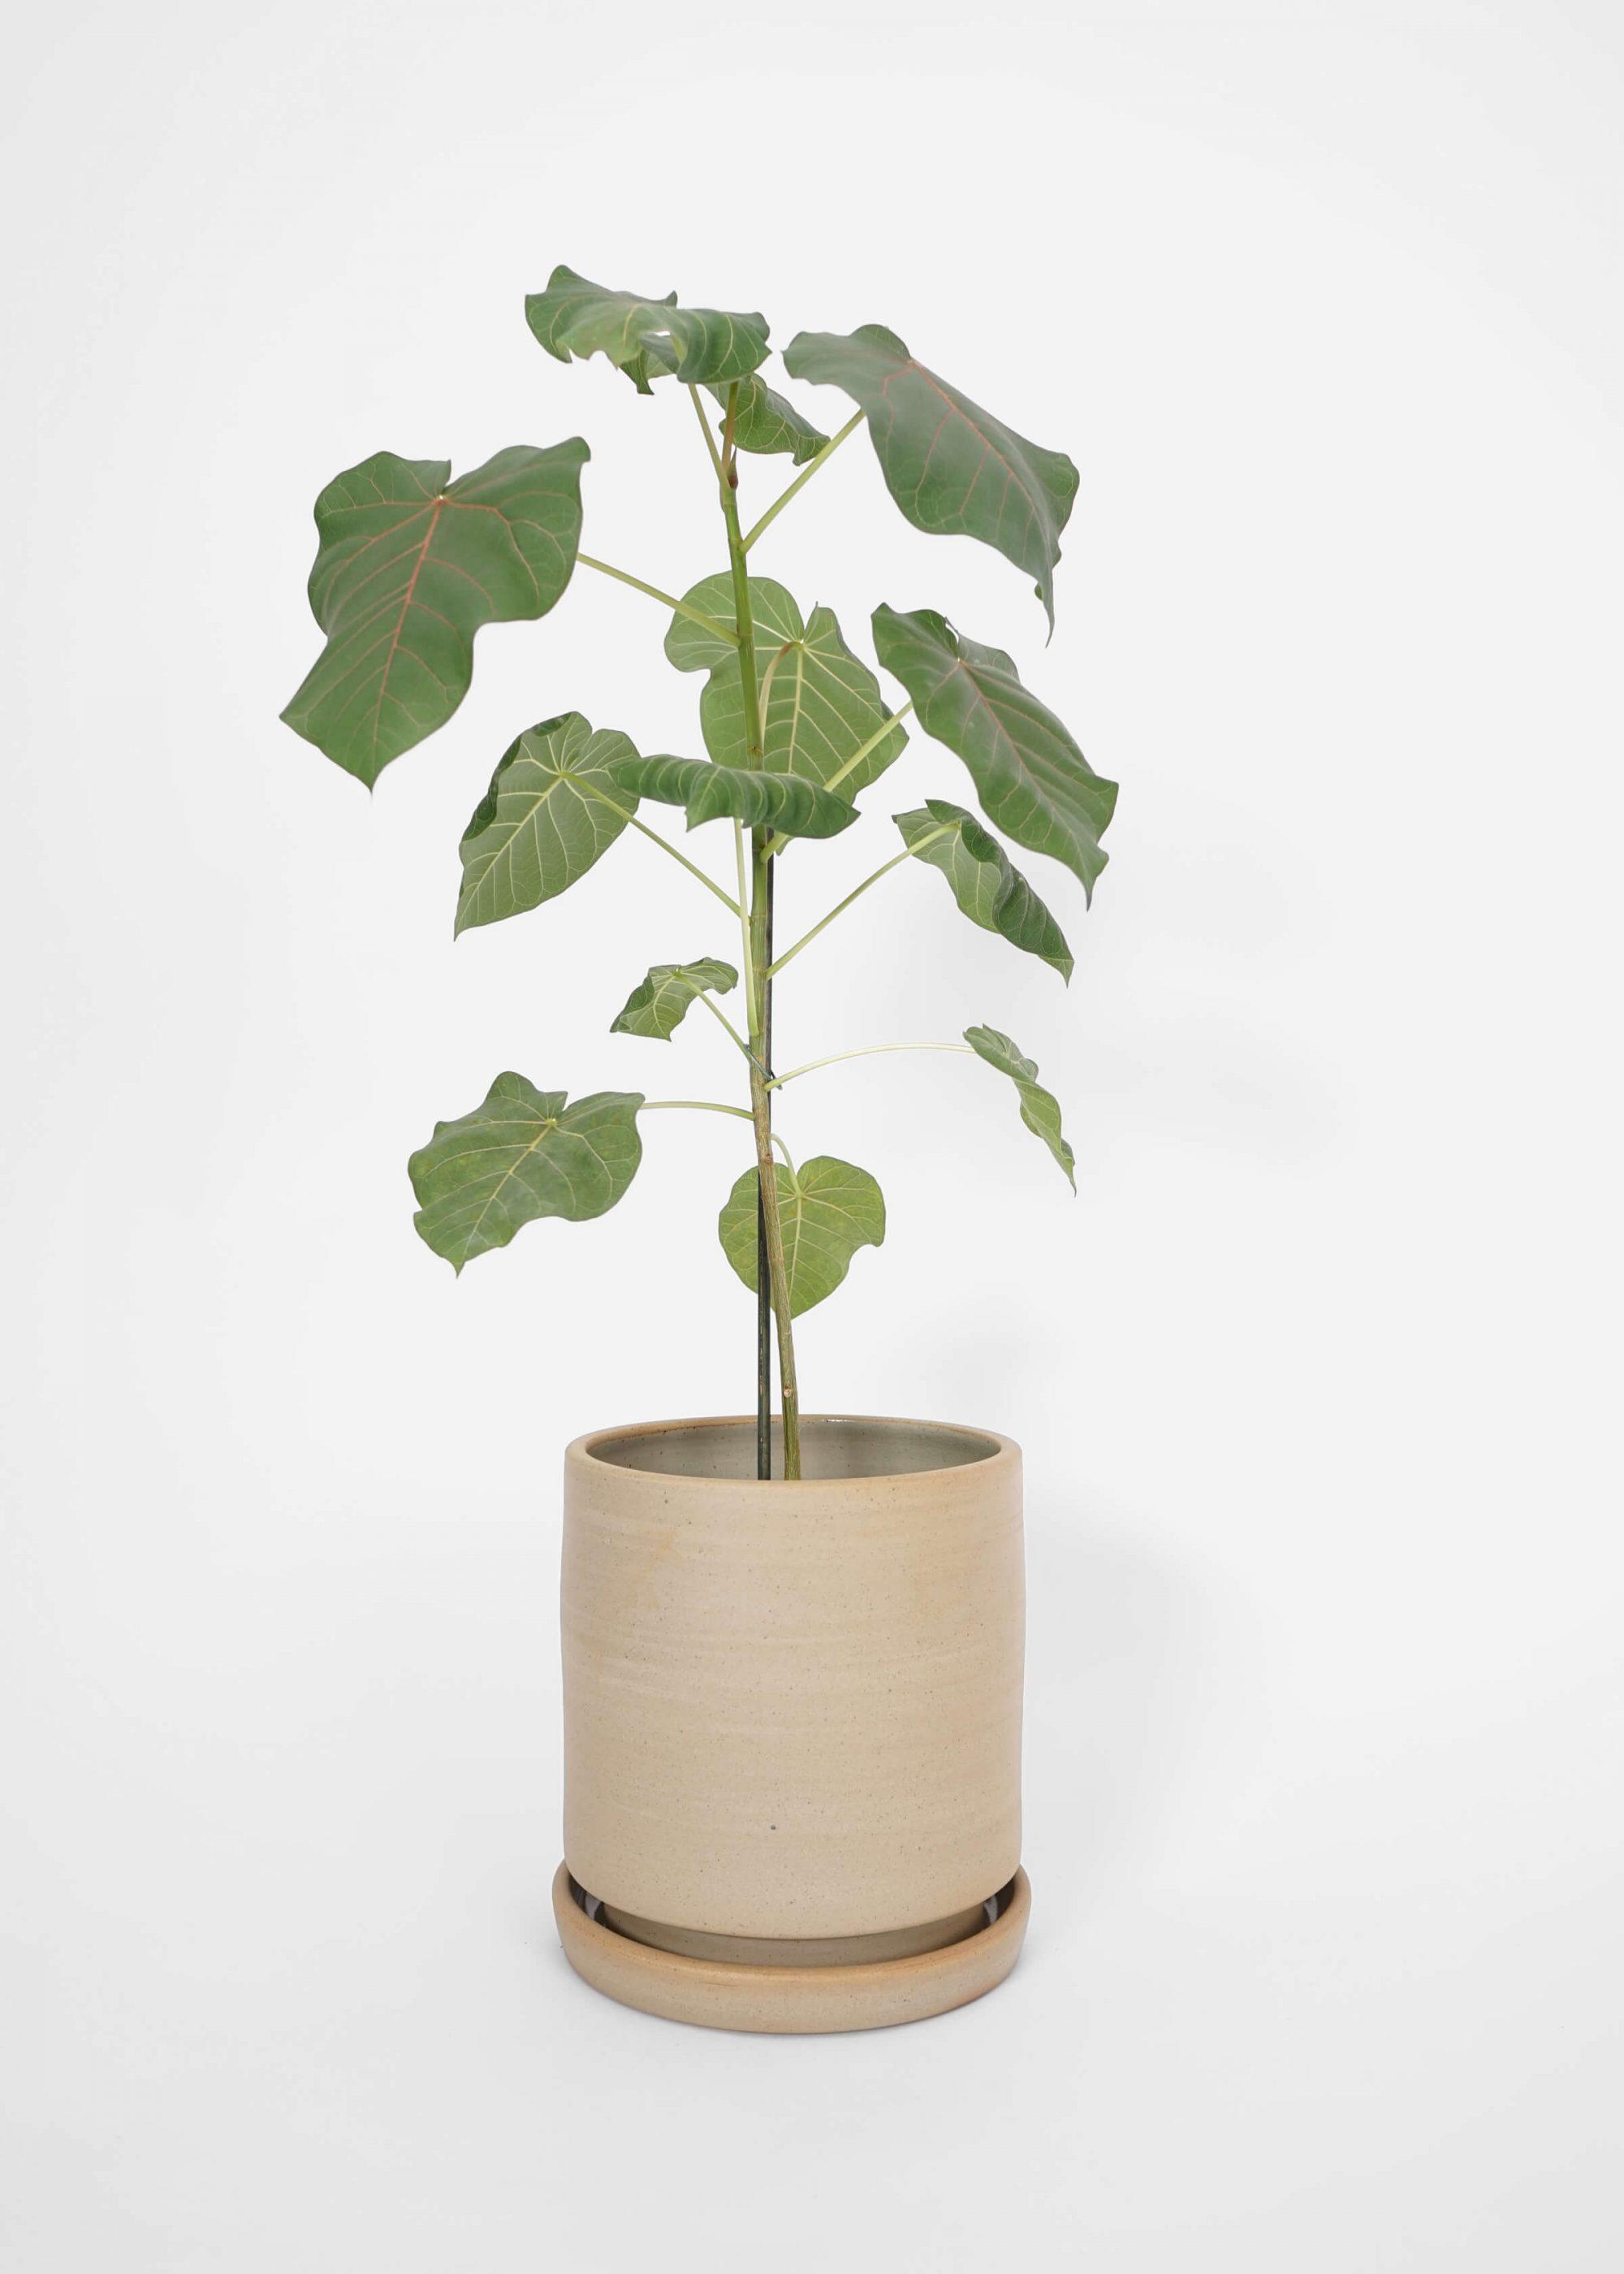 Product image for N° ICSD3 BRUTAL Planter Unglazed Finish Medium